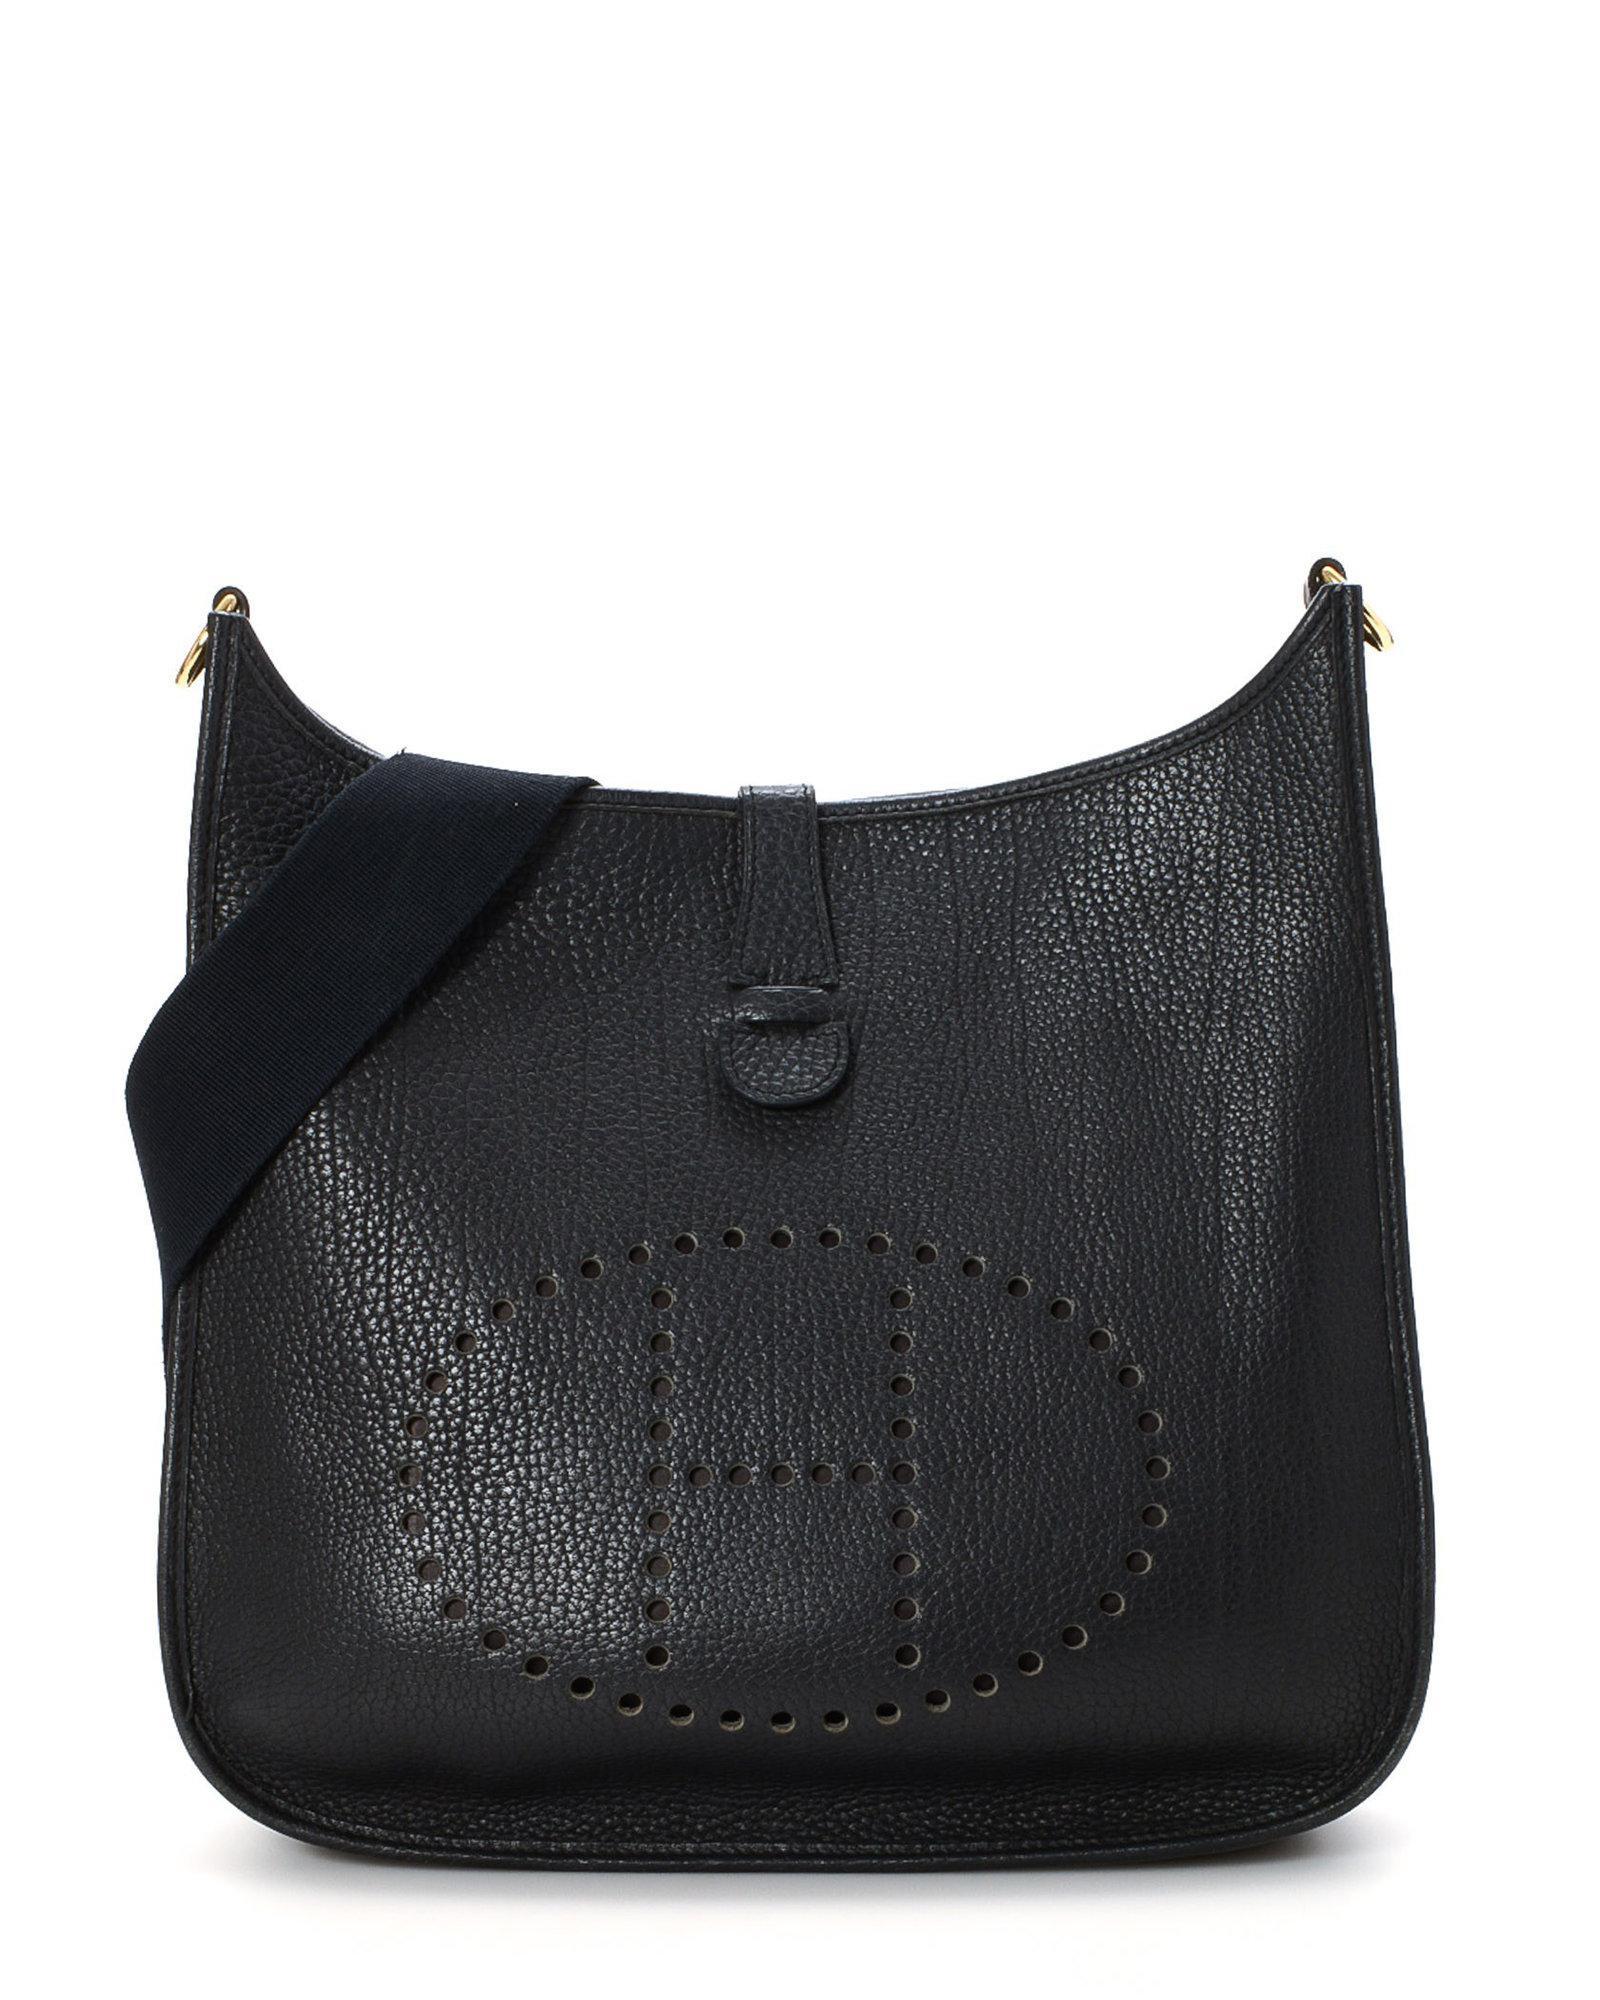 28e691269a ... 2 0b08e 58dec cheap lyst hermès evelyne iii 33 shoulder bag vintage in  black 7d3dc 351bf czech hermes black ...